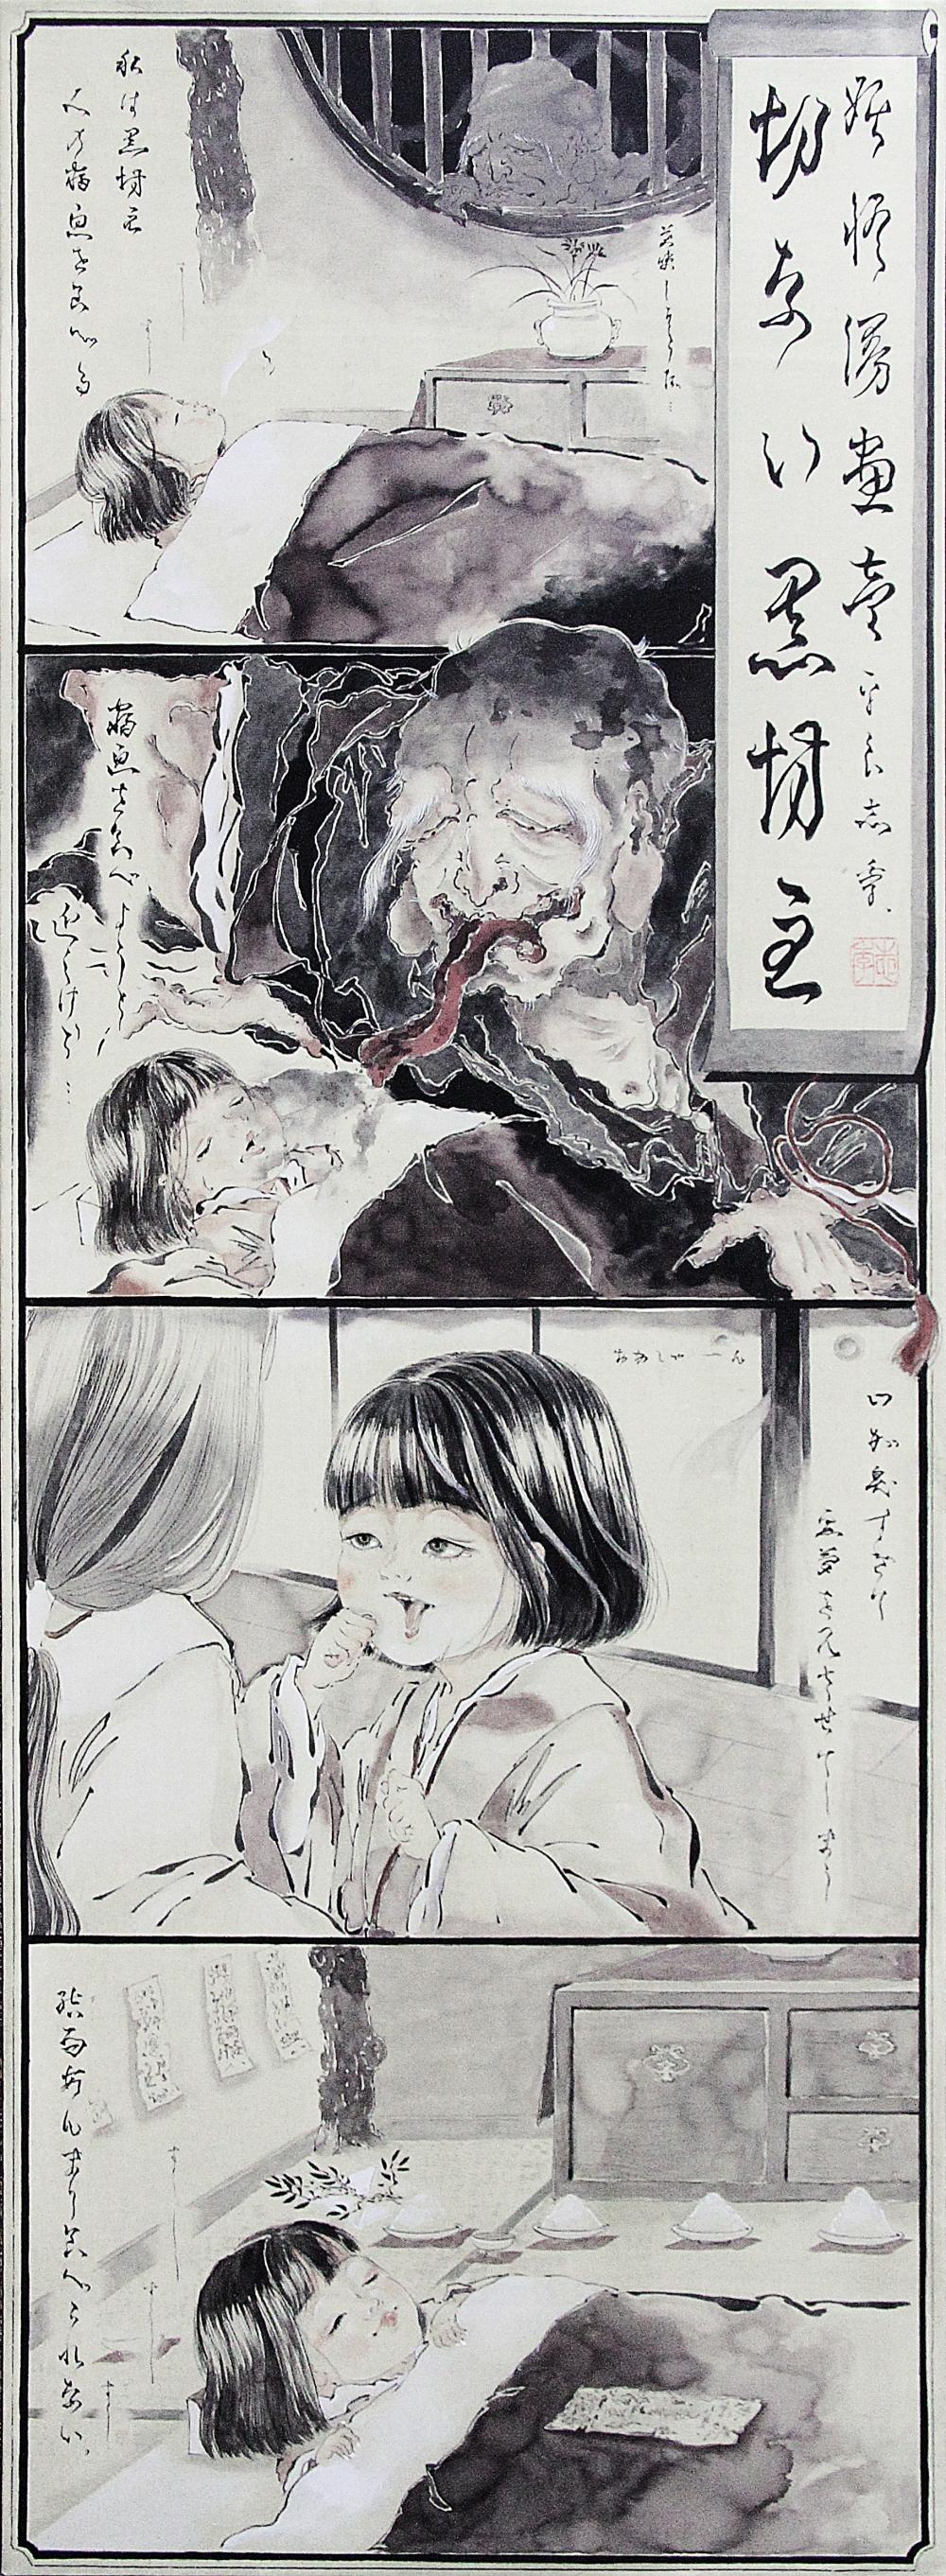 exid1688wid1780 / ・妖怪漫画壱 切ない黒坊主